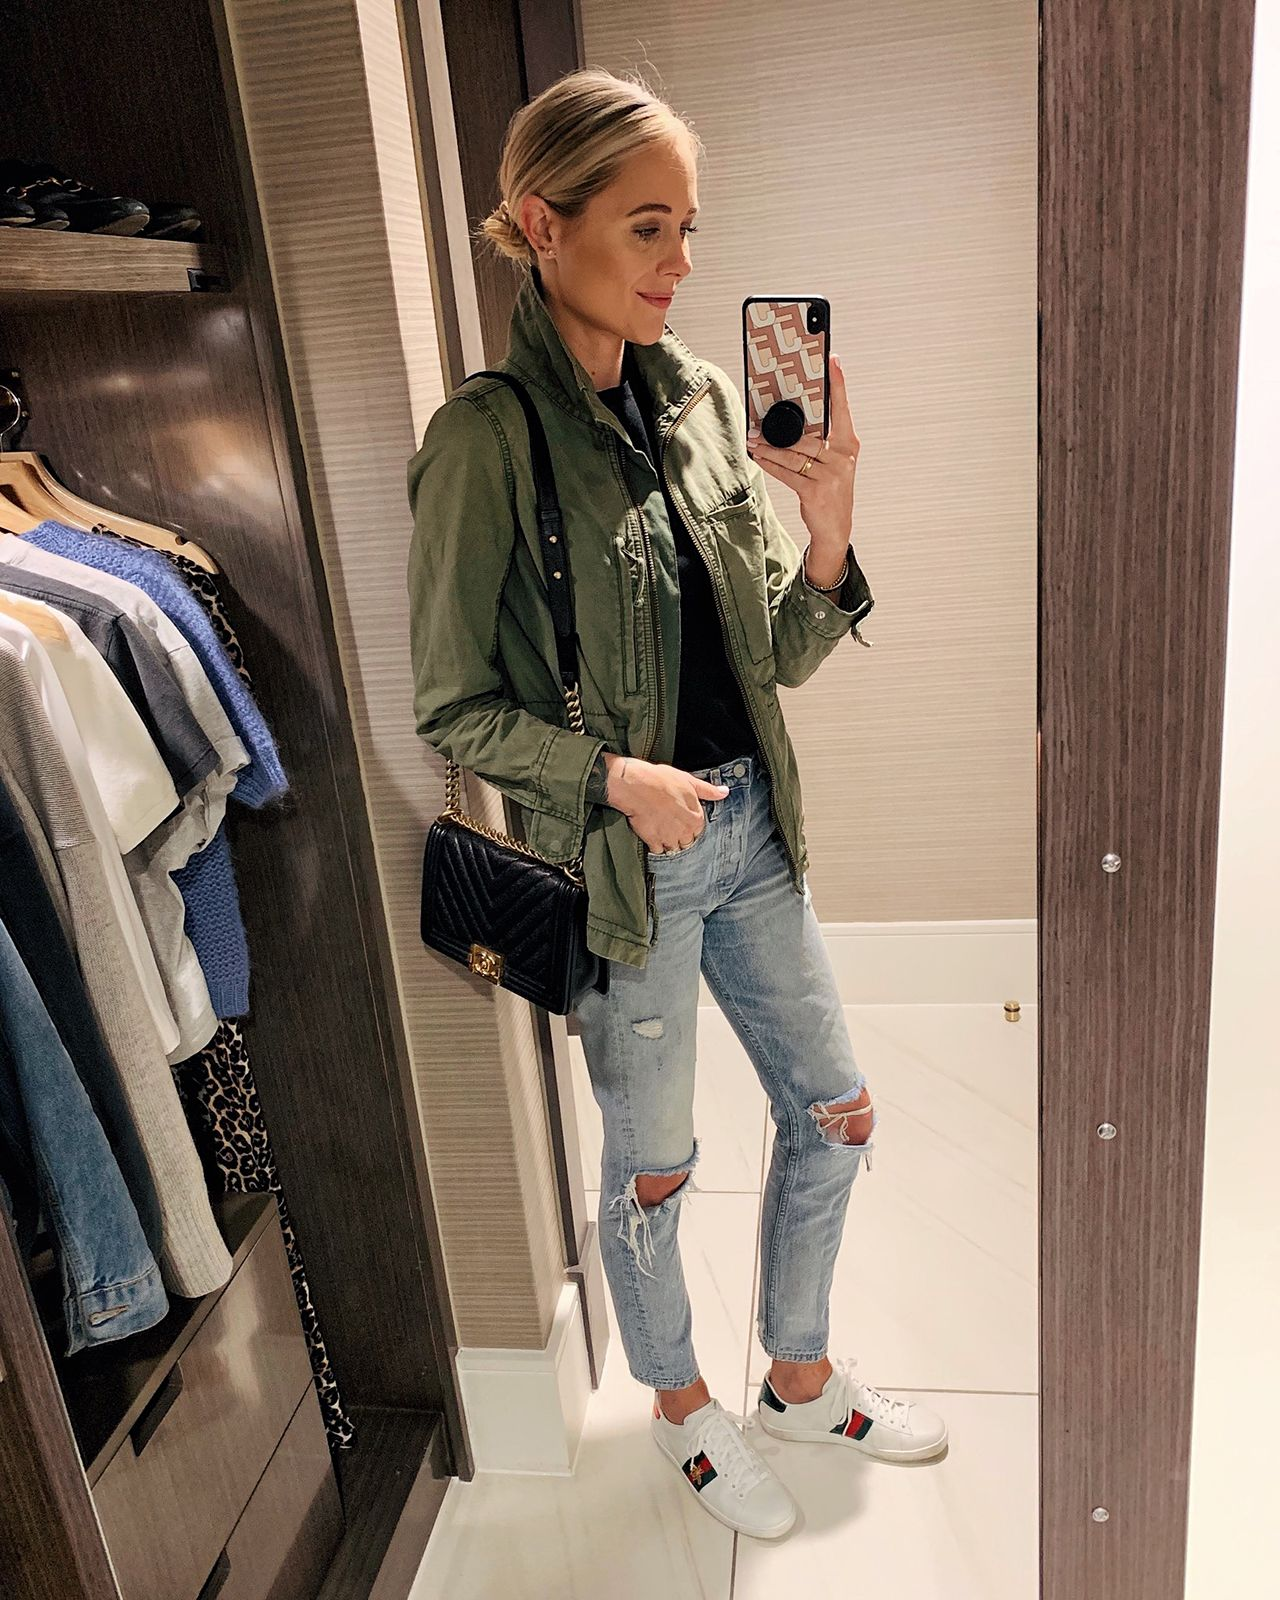 Fashion Jackson Wearing Green Utility Jacket Black Top Denim